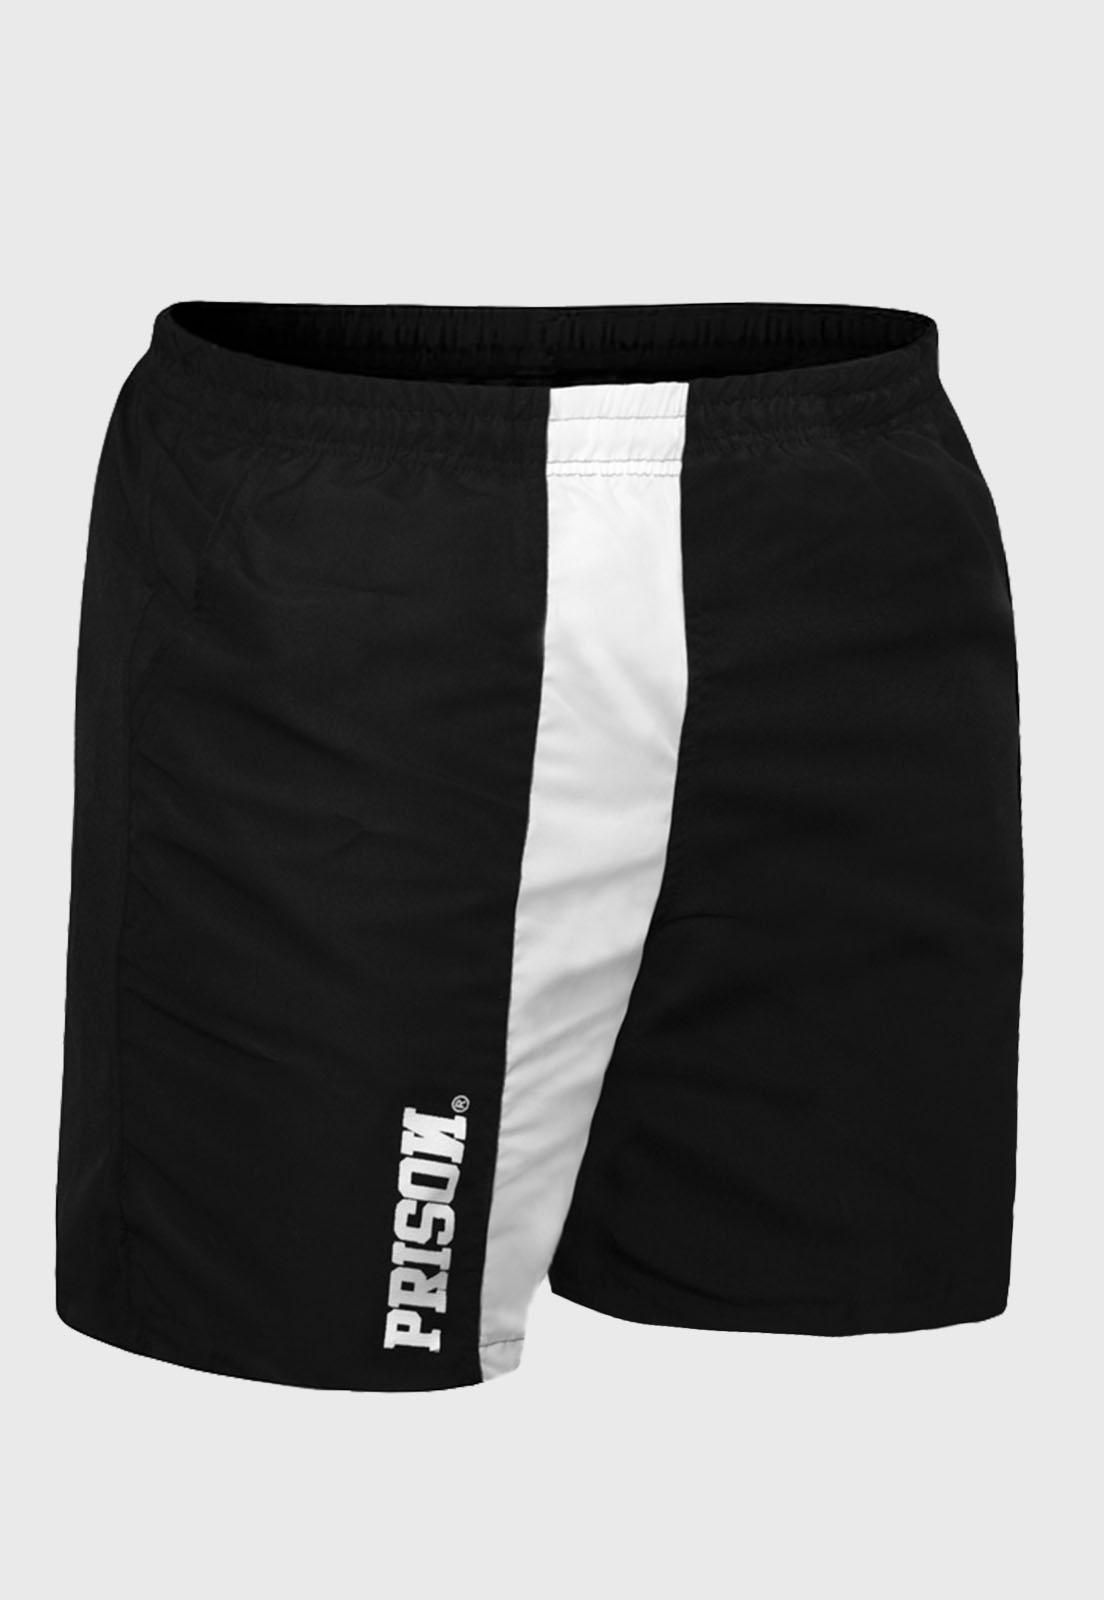 Bermuda Prison Streetwear NYC Sports